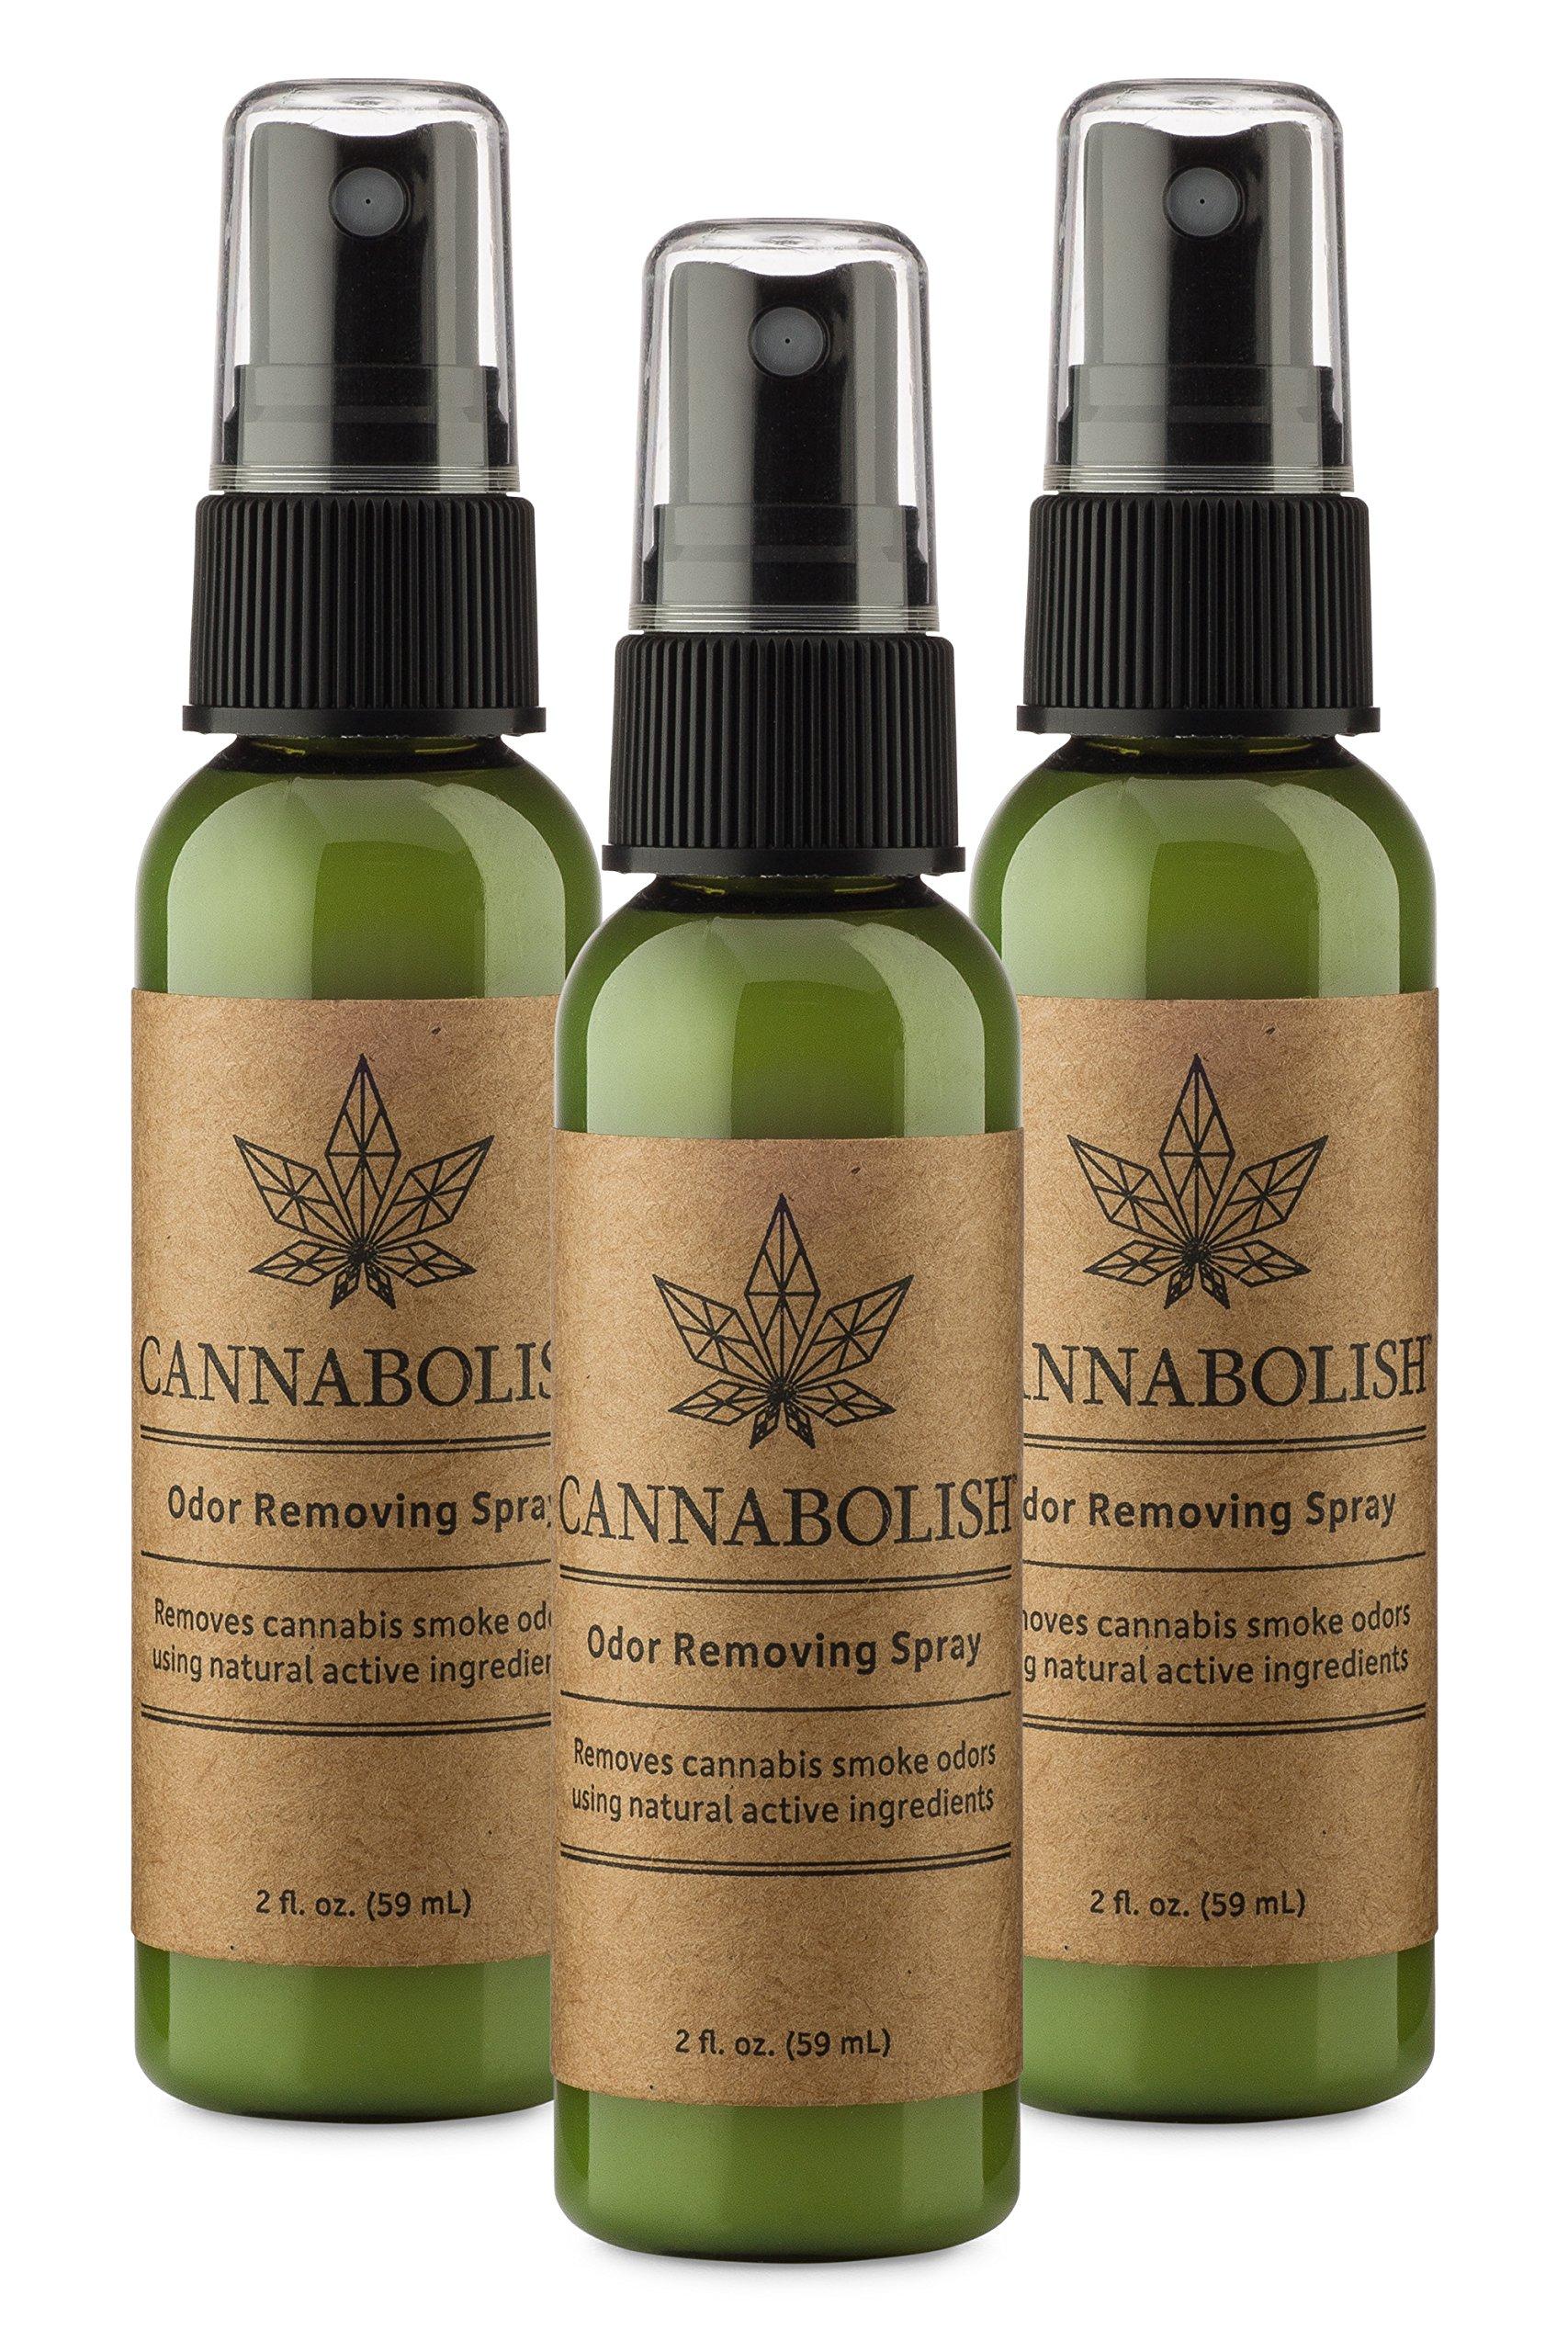 Cannabolish Cannabis Smoke Odor Removing Spray, 2 fl. oz. Travel Size (Pack of 3)